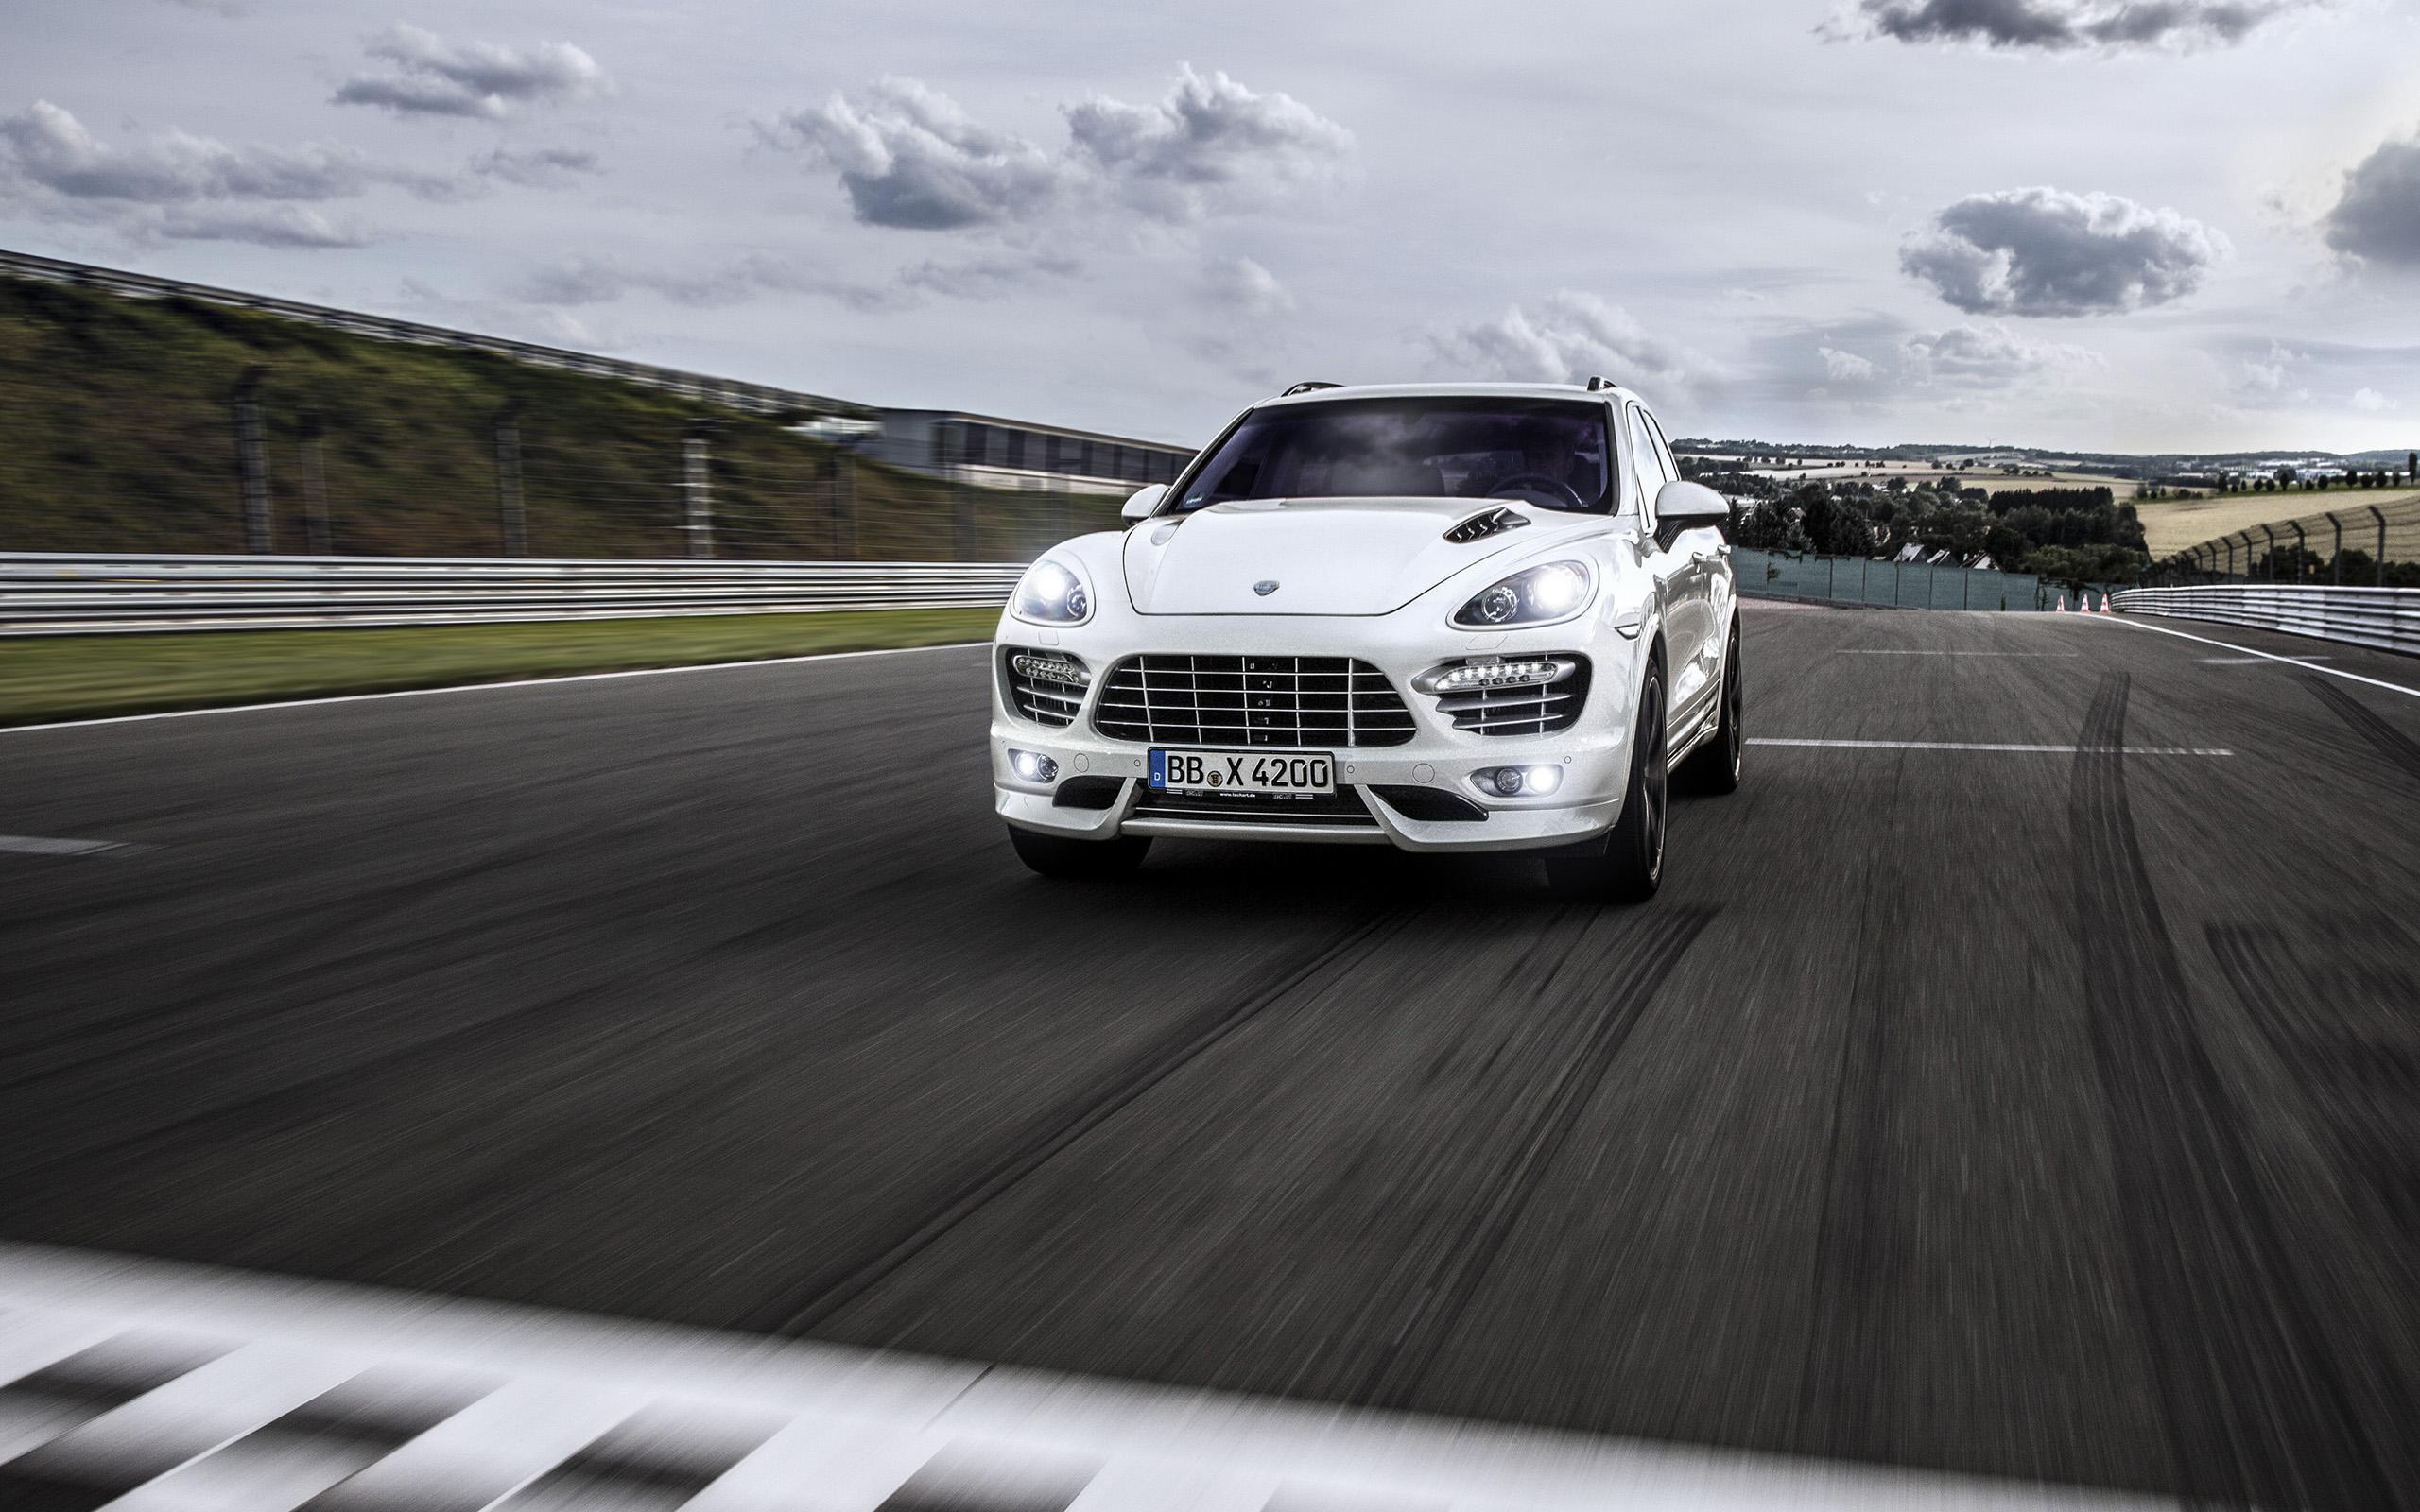 2013 Porsche Cayenne S Diesel By Techart Wallpaper Hd Car